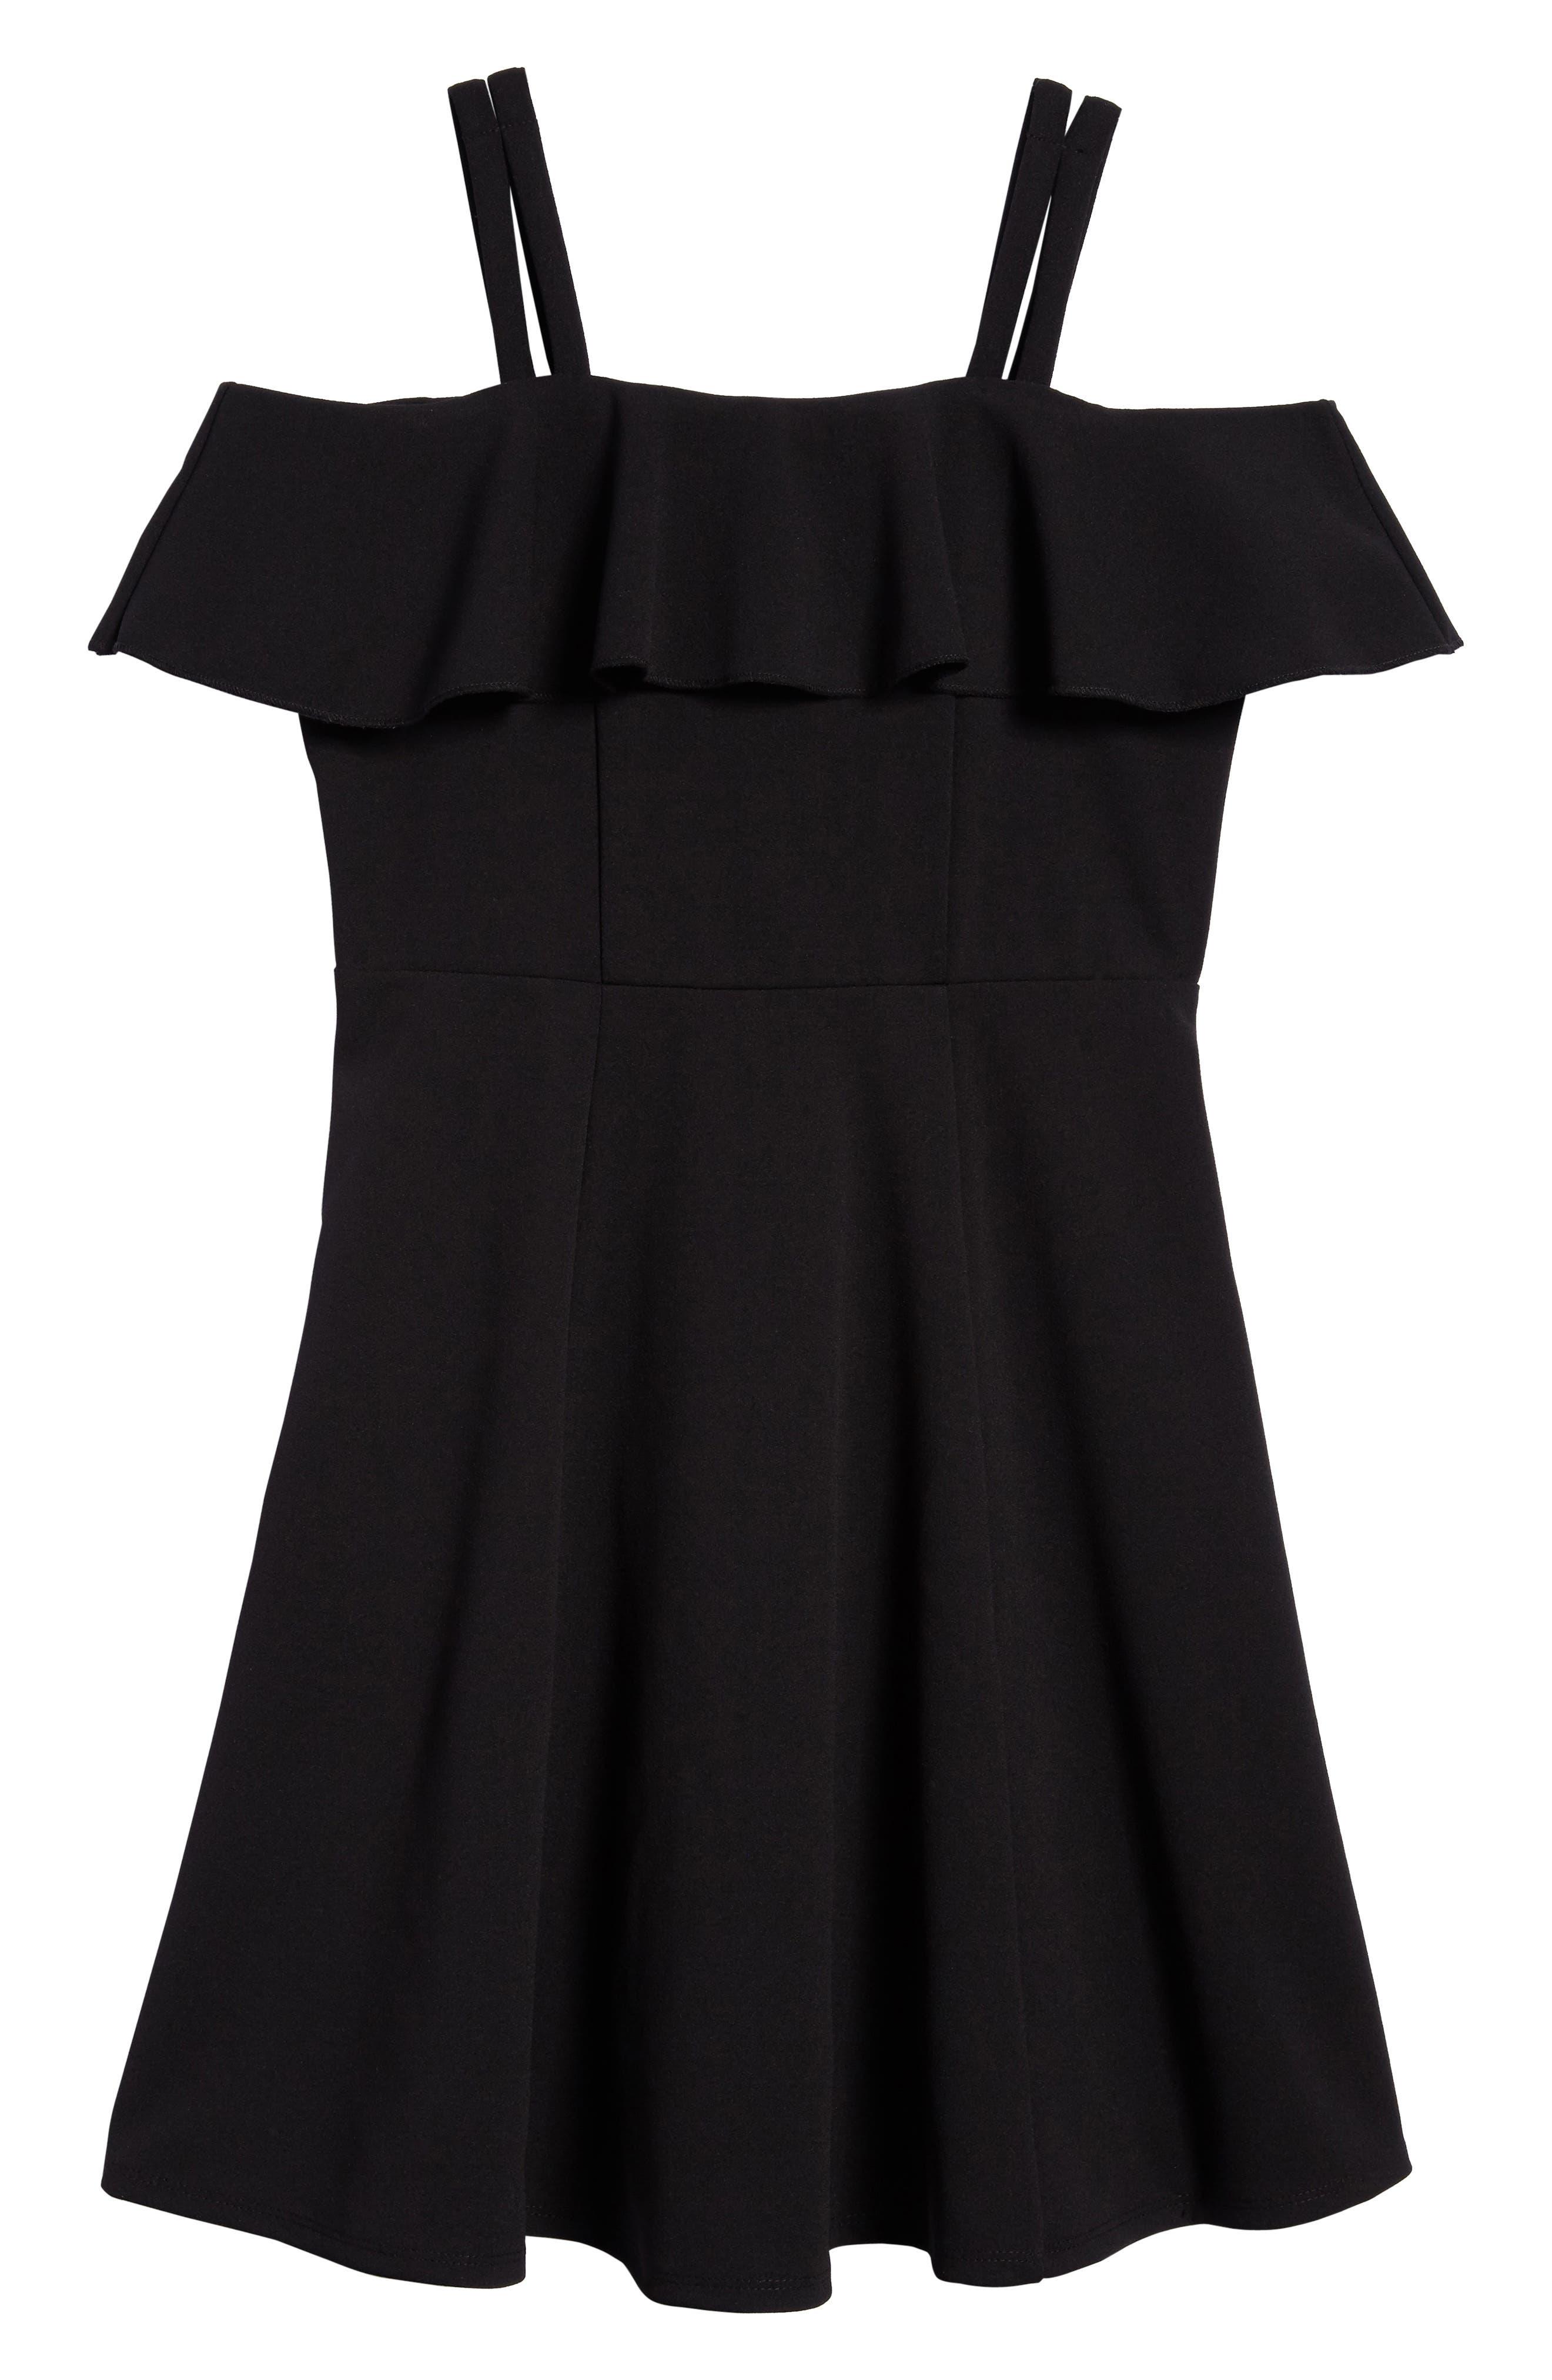 Off the Shoulder Ruffle Dress,                             Main thumbnail 1, color,                             Black